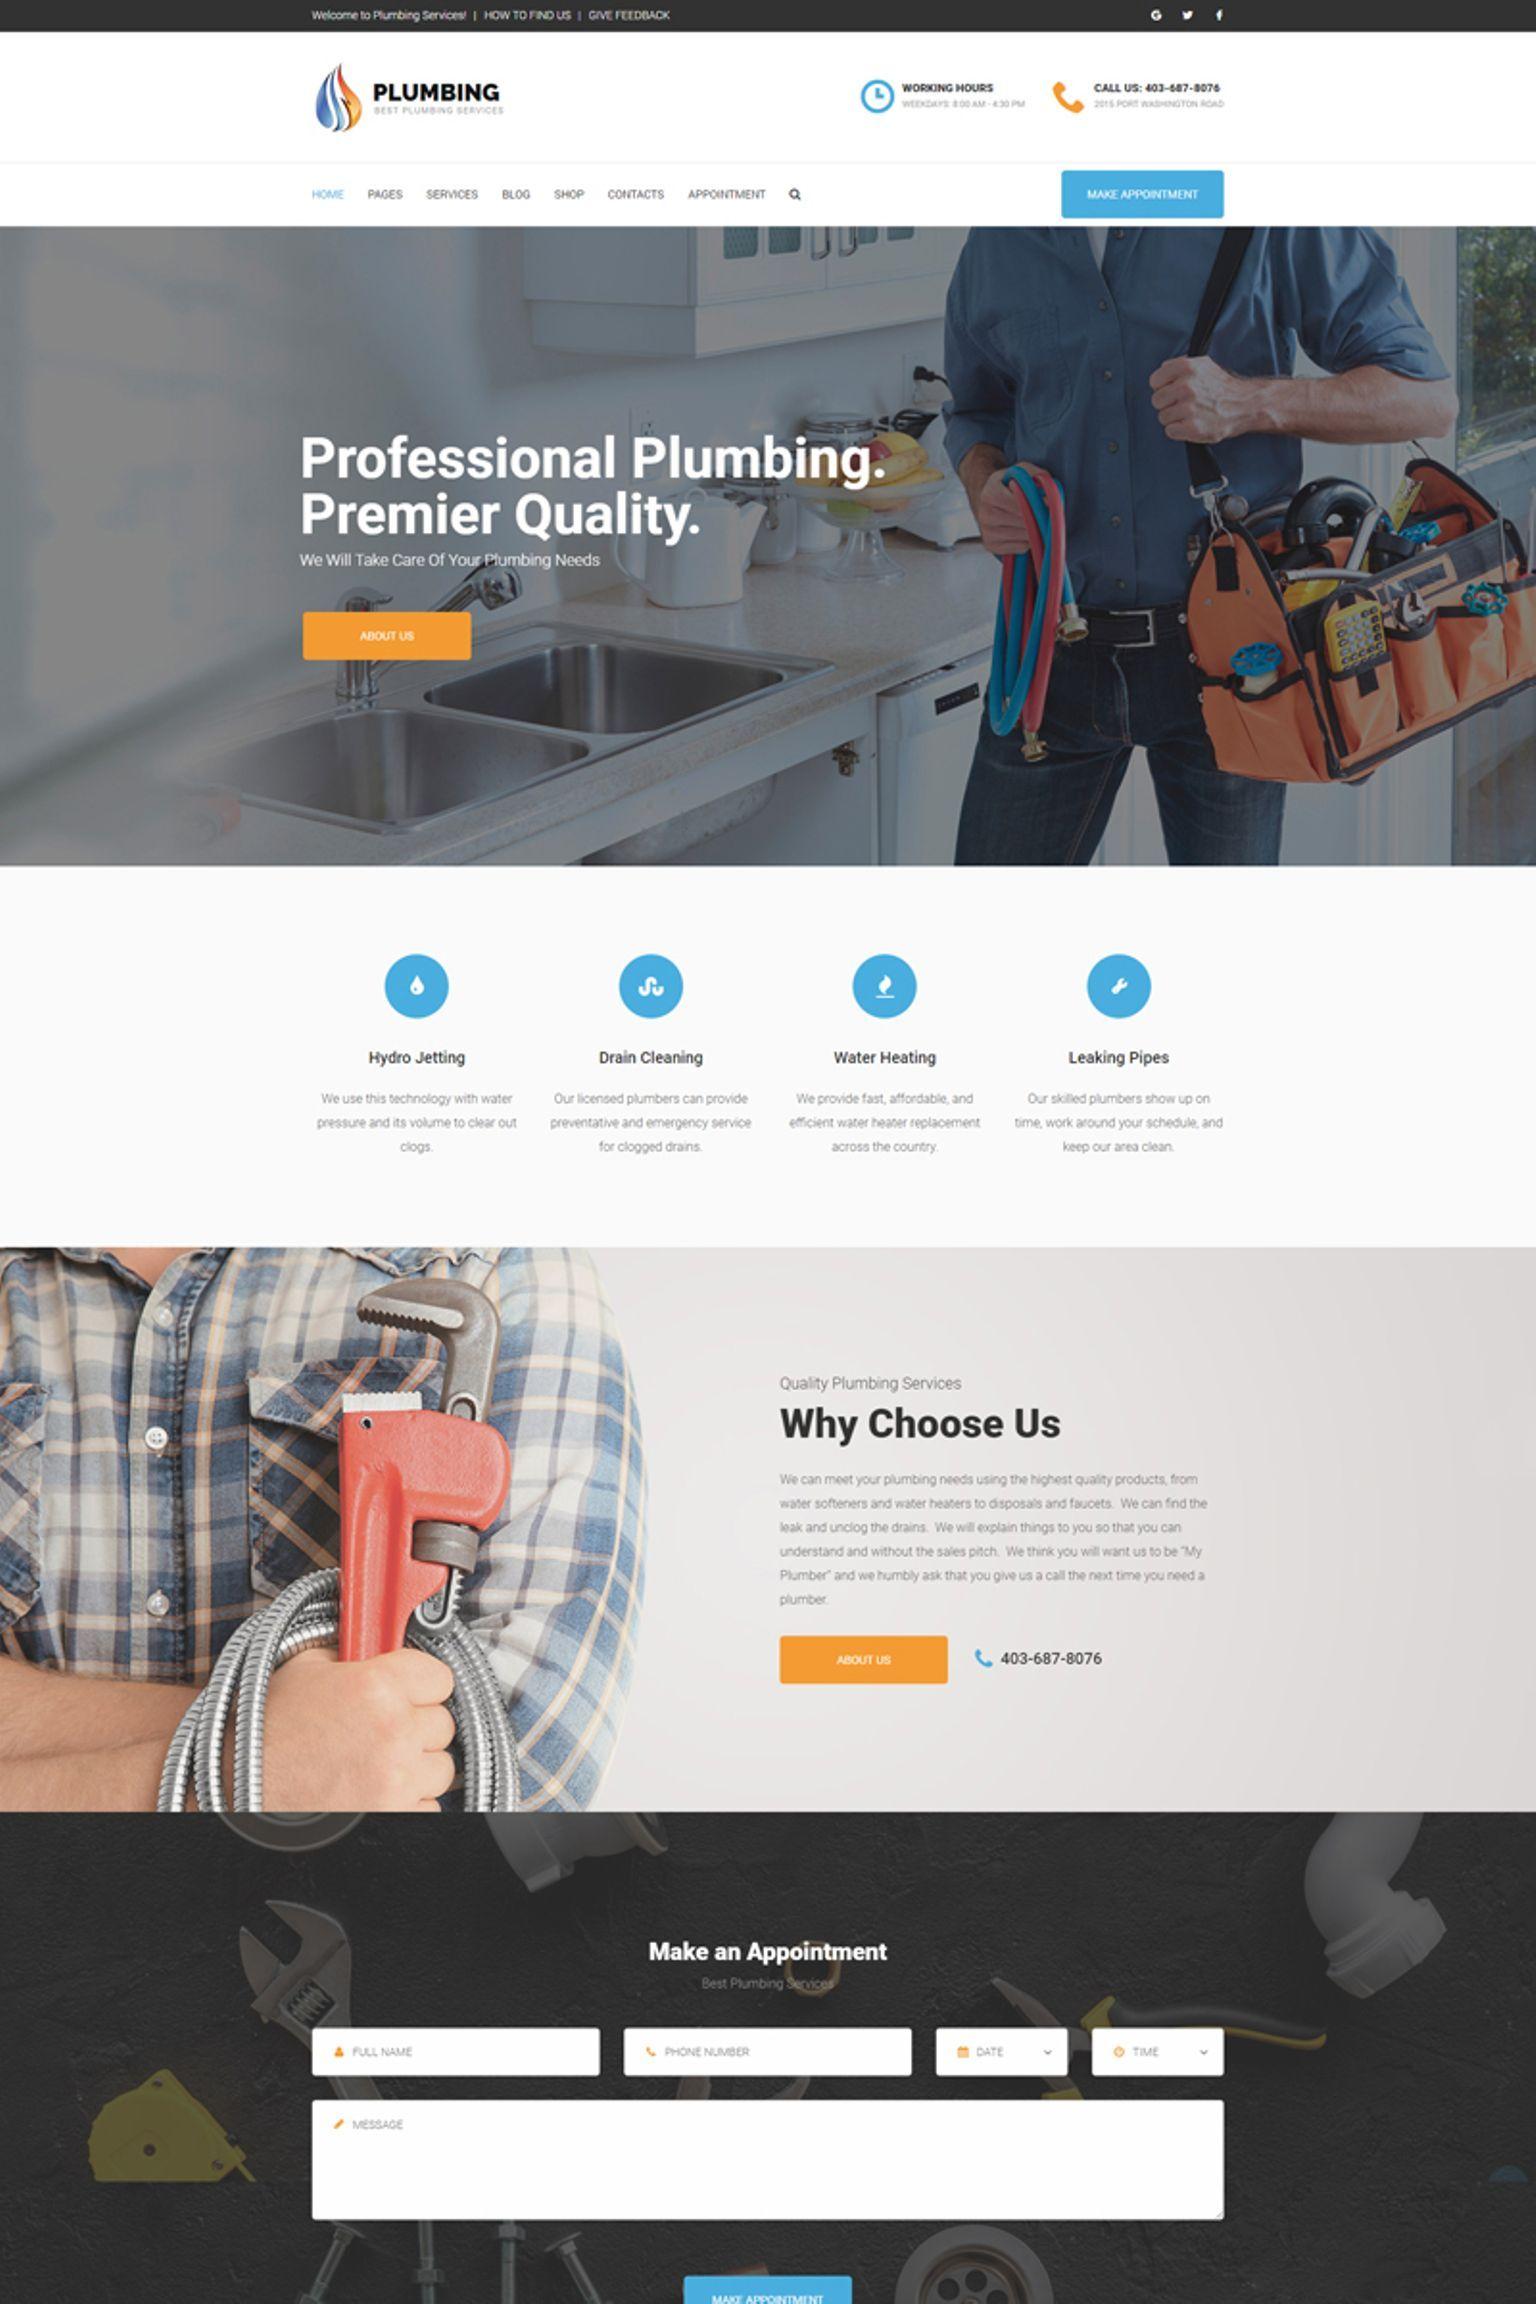 Plumbing Home Maintenance Agency Wordpress Theme Maintenance Home Plumbing Theme Wordpress Plumbing Modern Wordpress Themes Wordpress Theme